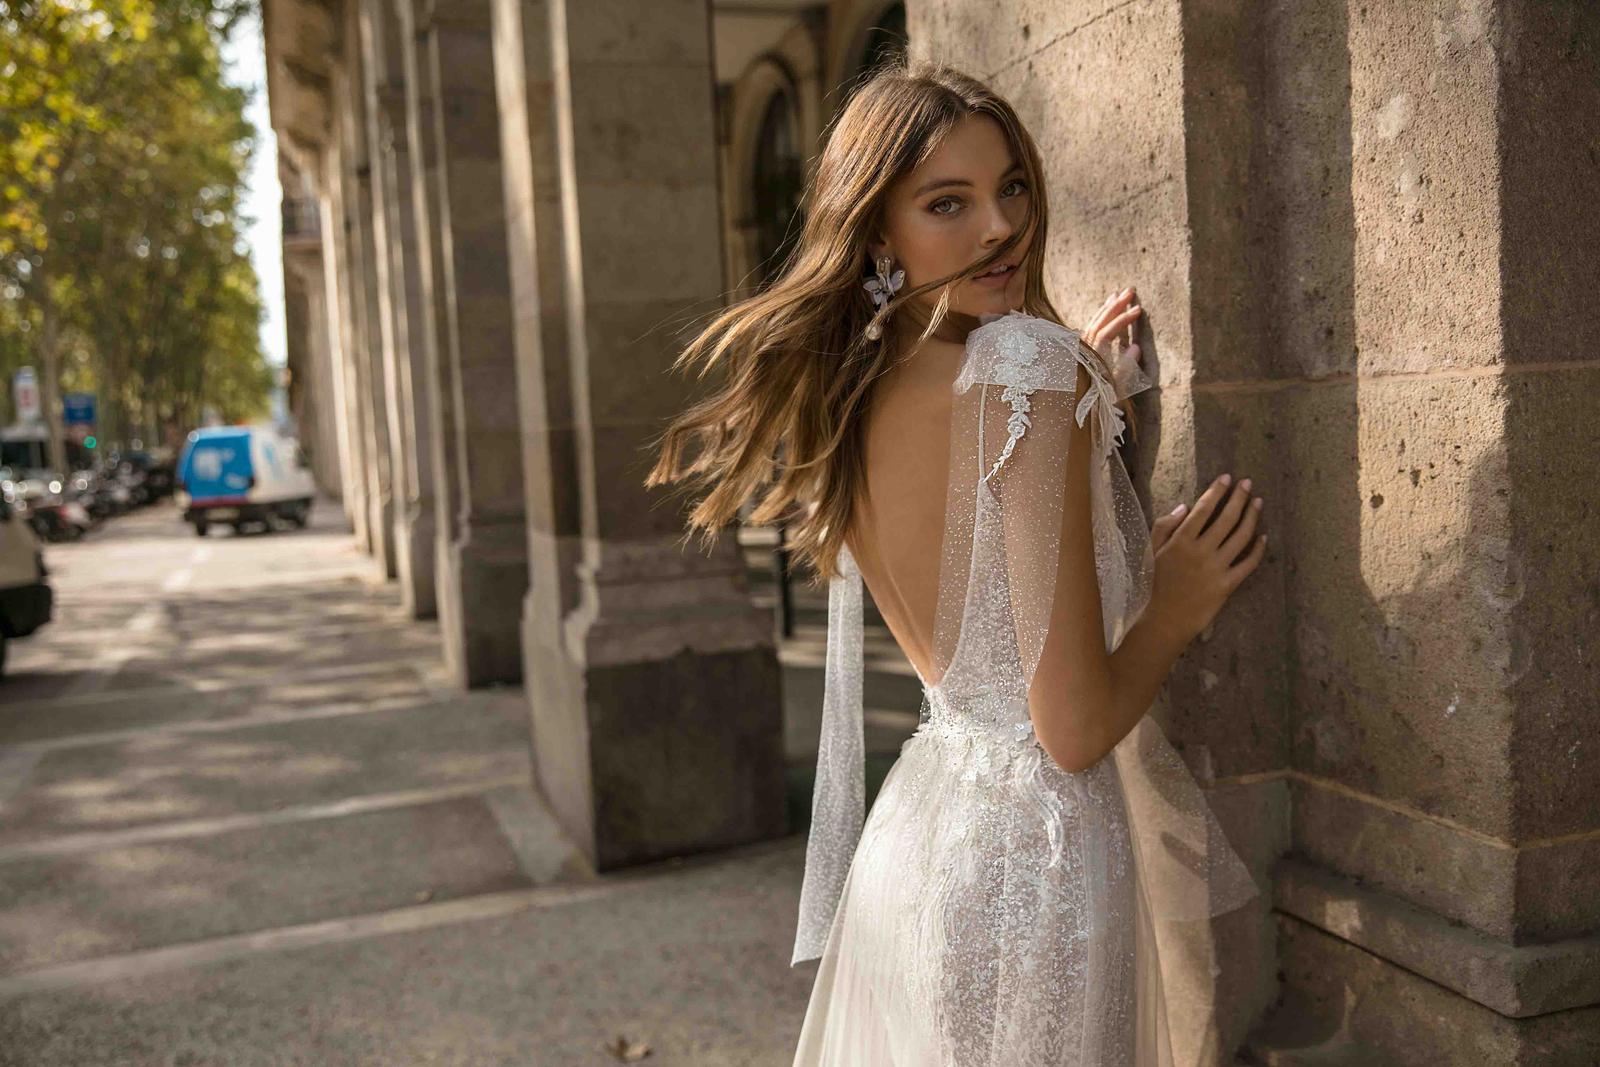 Muse by Berta * Svadobné šaty z kolekcií na rok 2019 - Obrázok č. 38